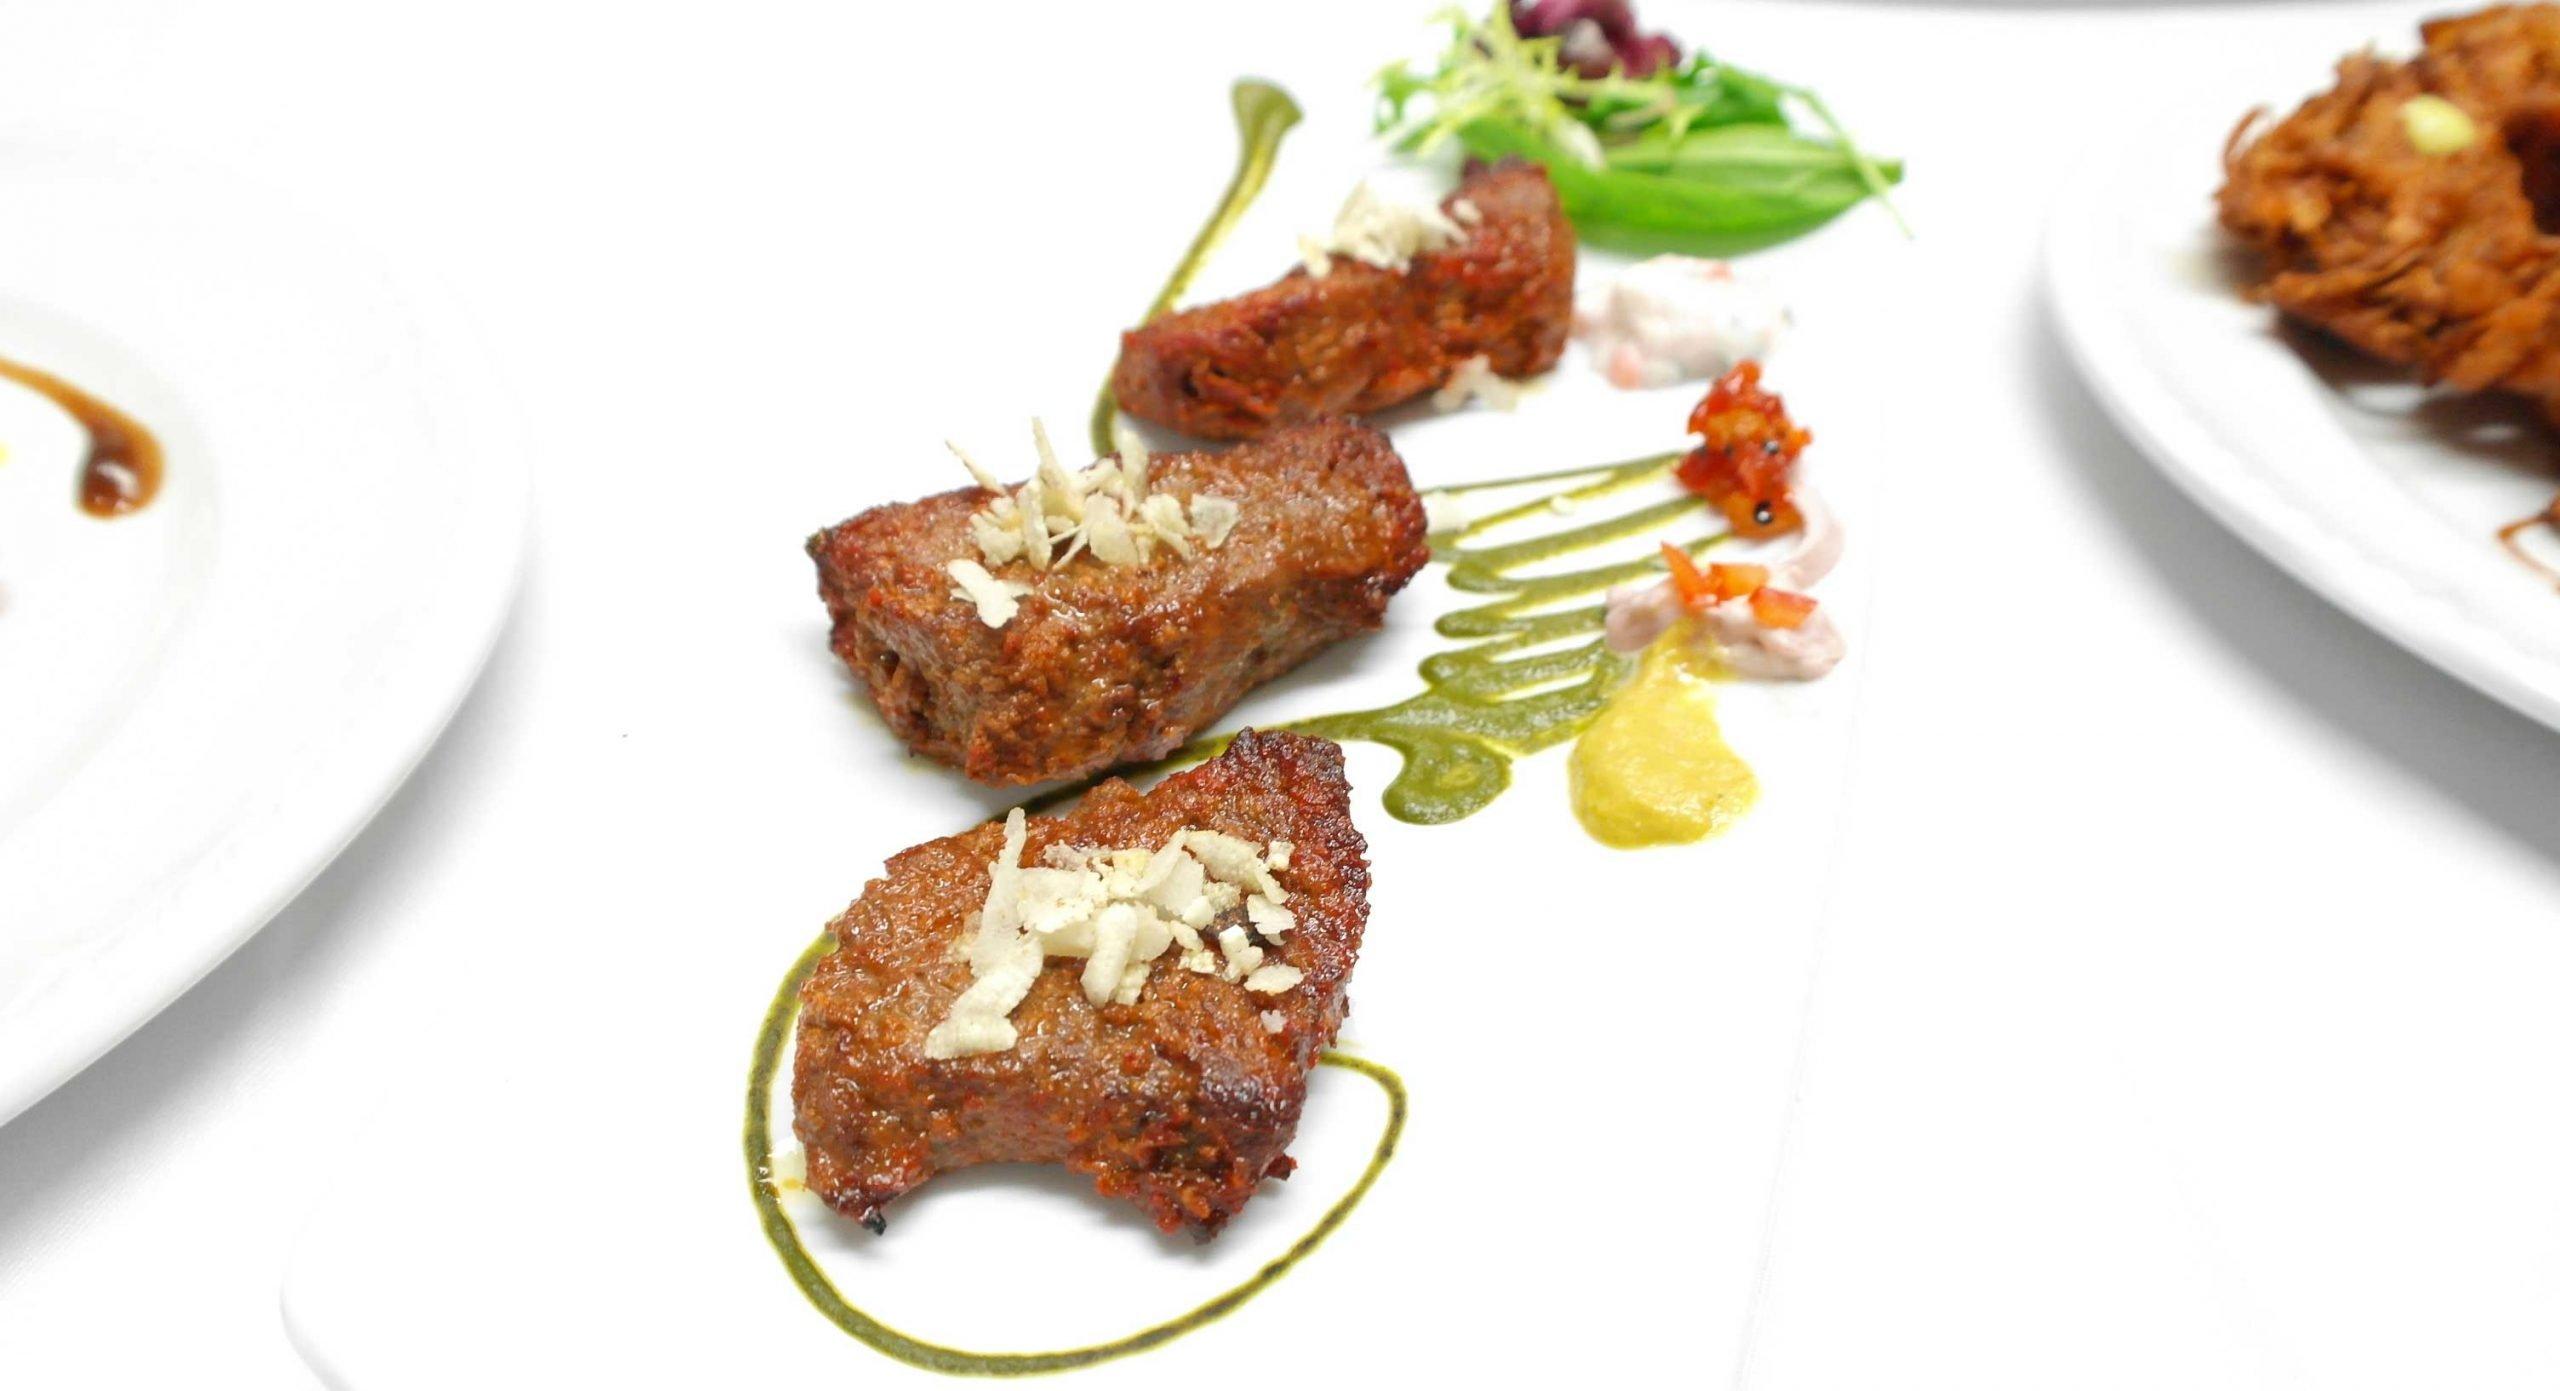 Food Image - The 29029 Restaurant Broadstone